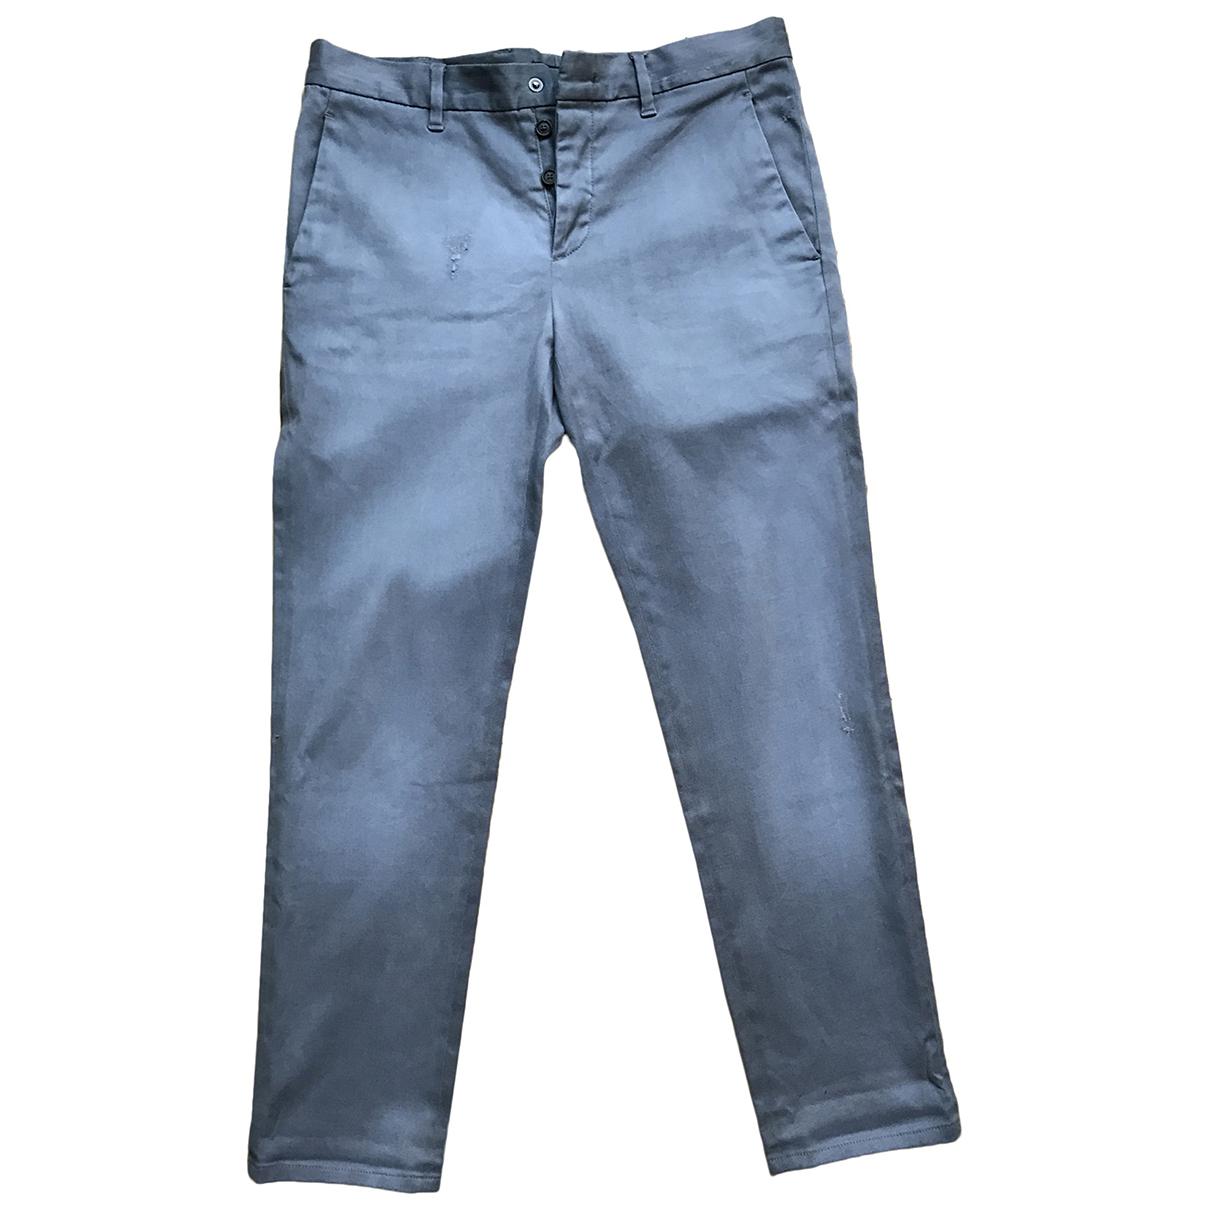 Prada N Blue Cotton Trousers for Men 34 UK - US